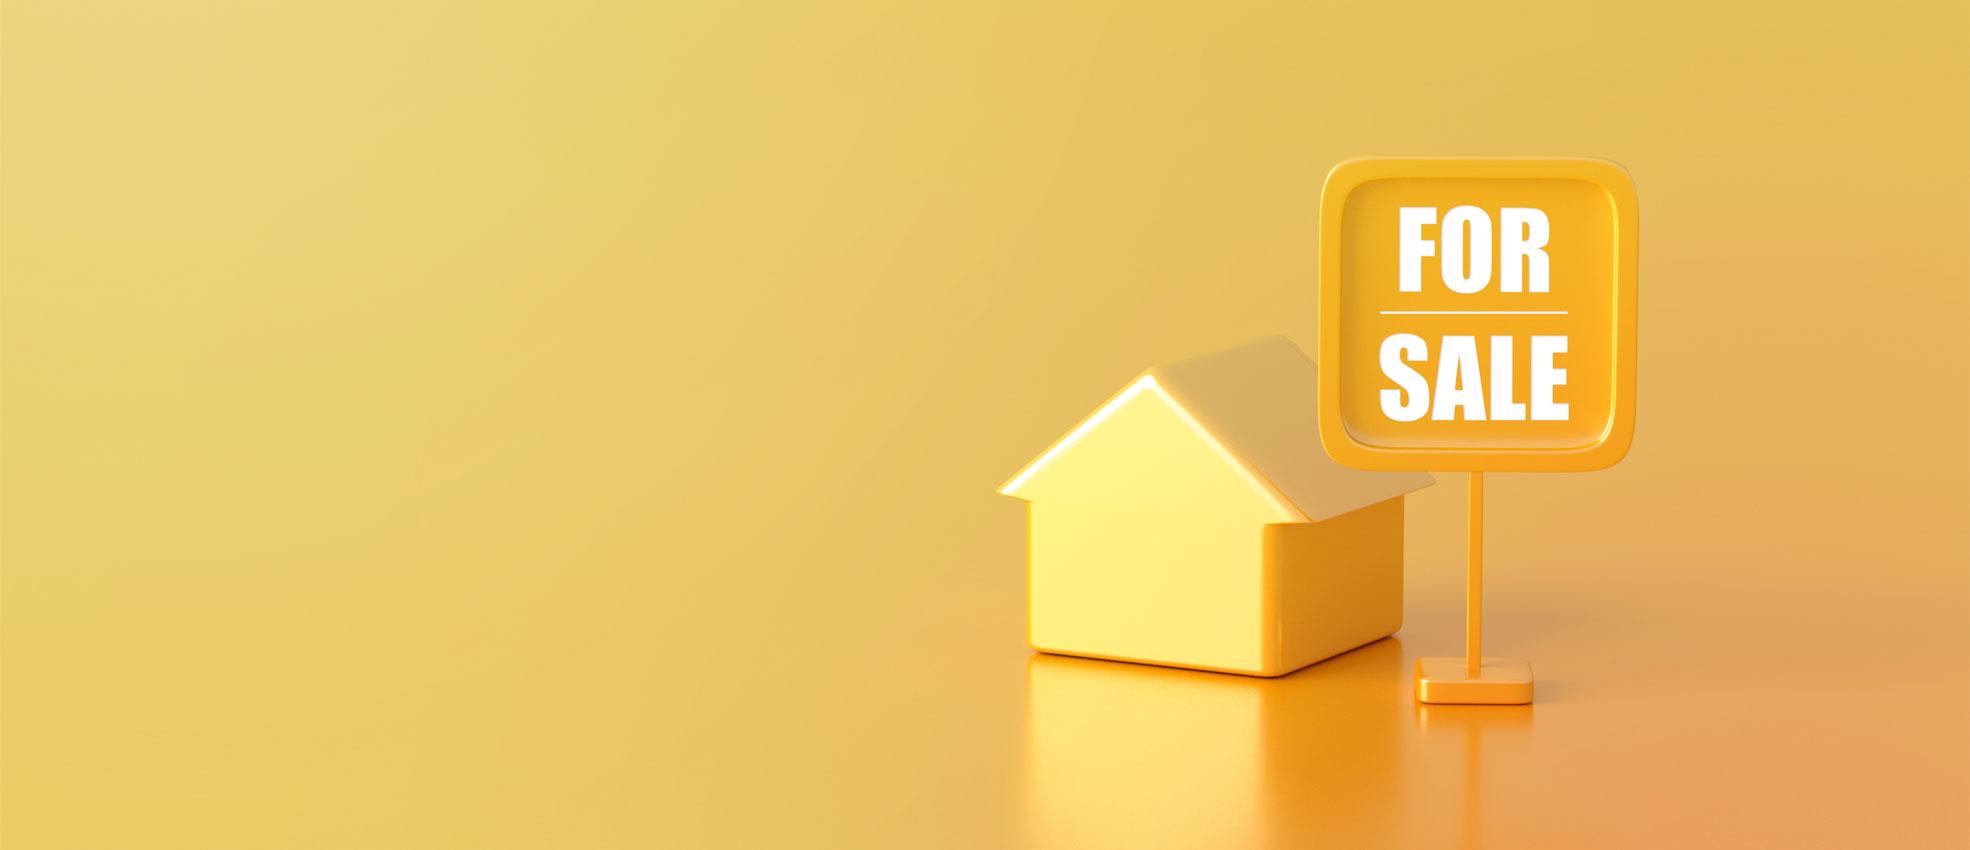 HUMUS Real Estate